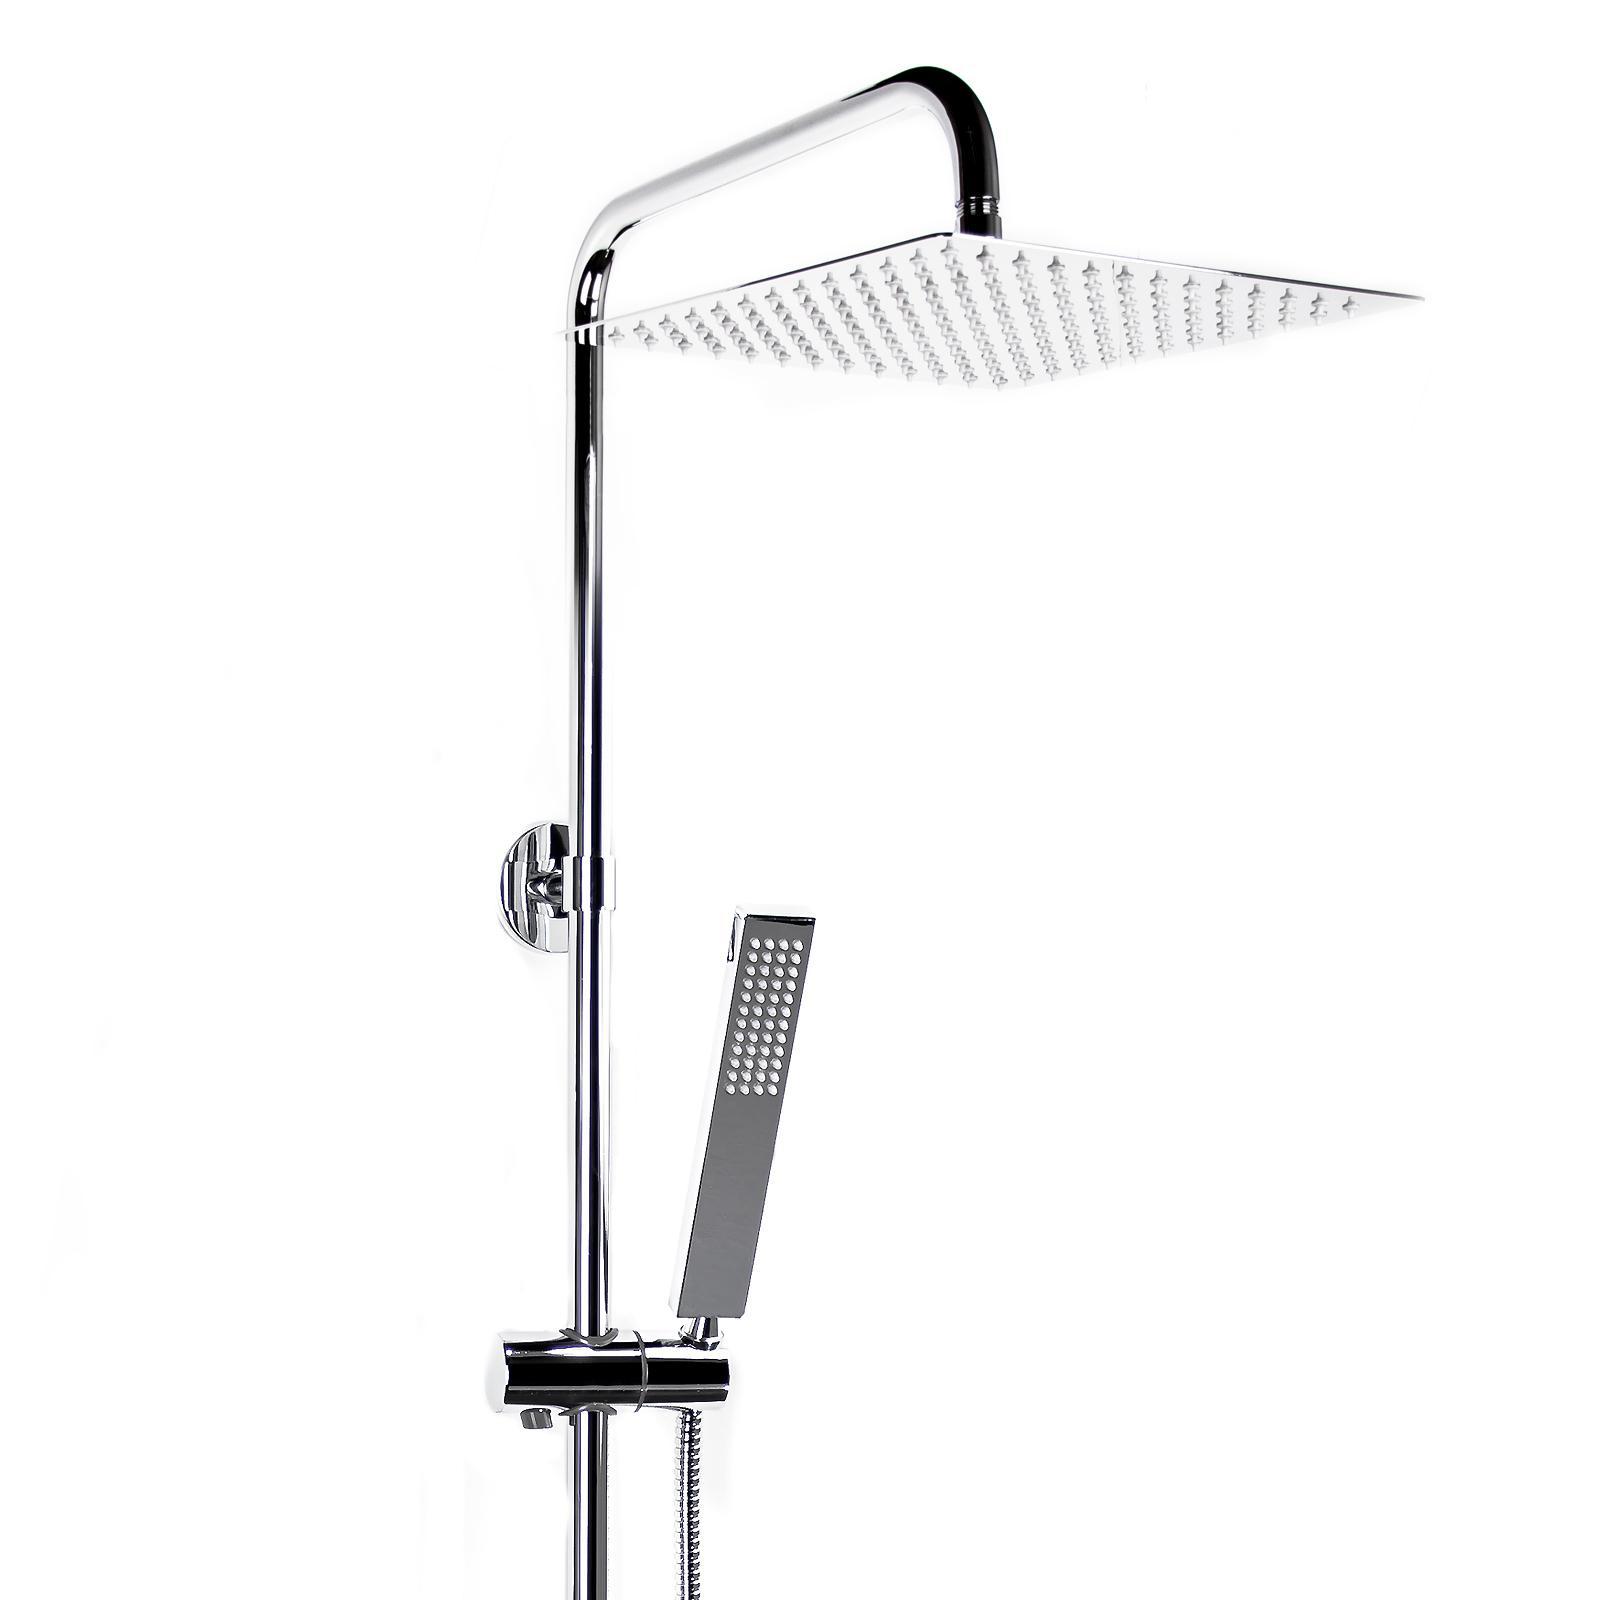 steinkirch aufputz duschkombi duschset dusche regendusche. Black Bedroom Furniture Sets. Home Design Ideas